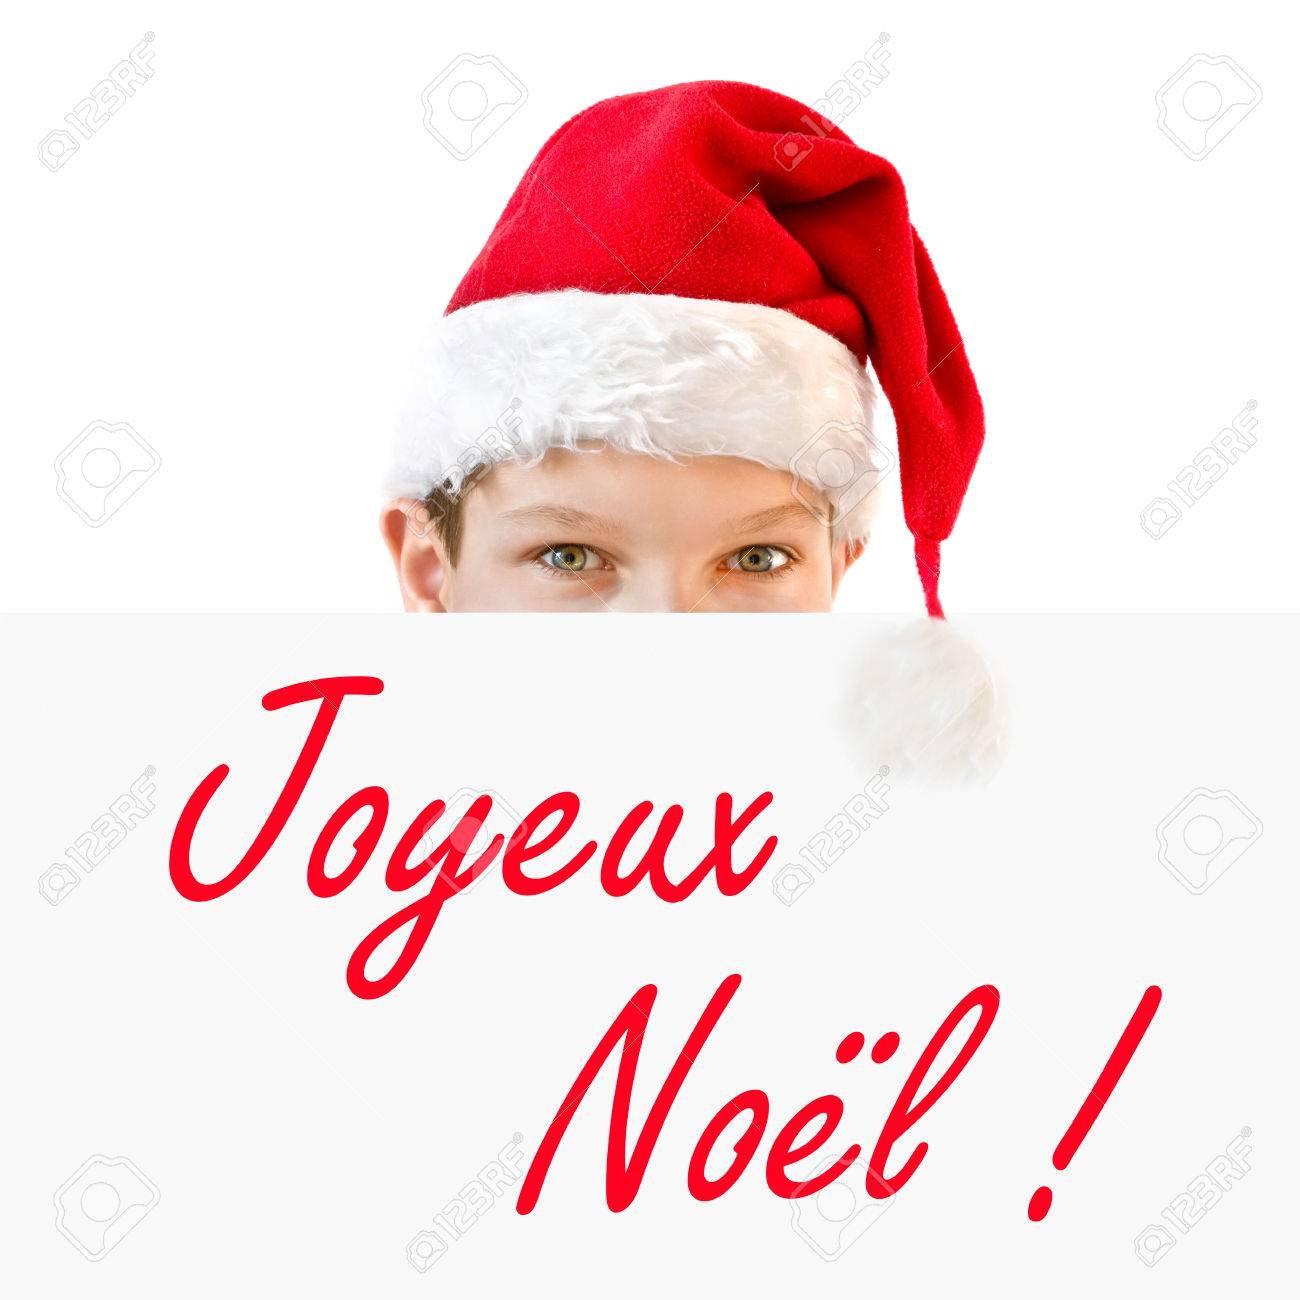 joyeux noel summary